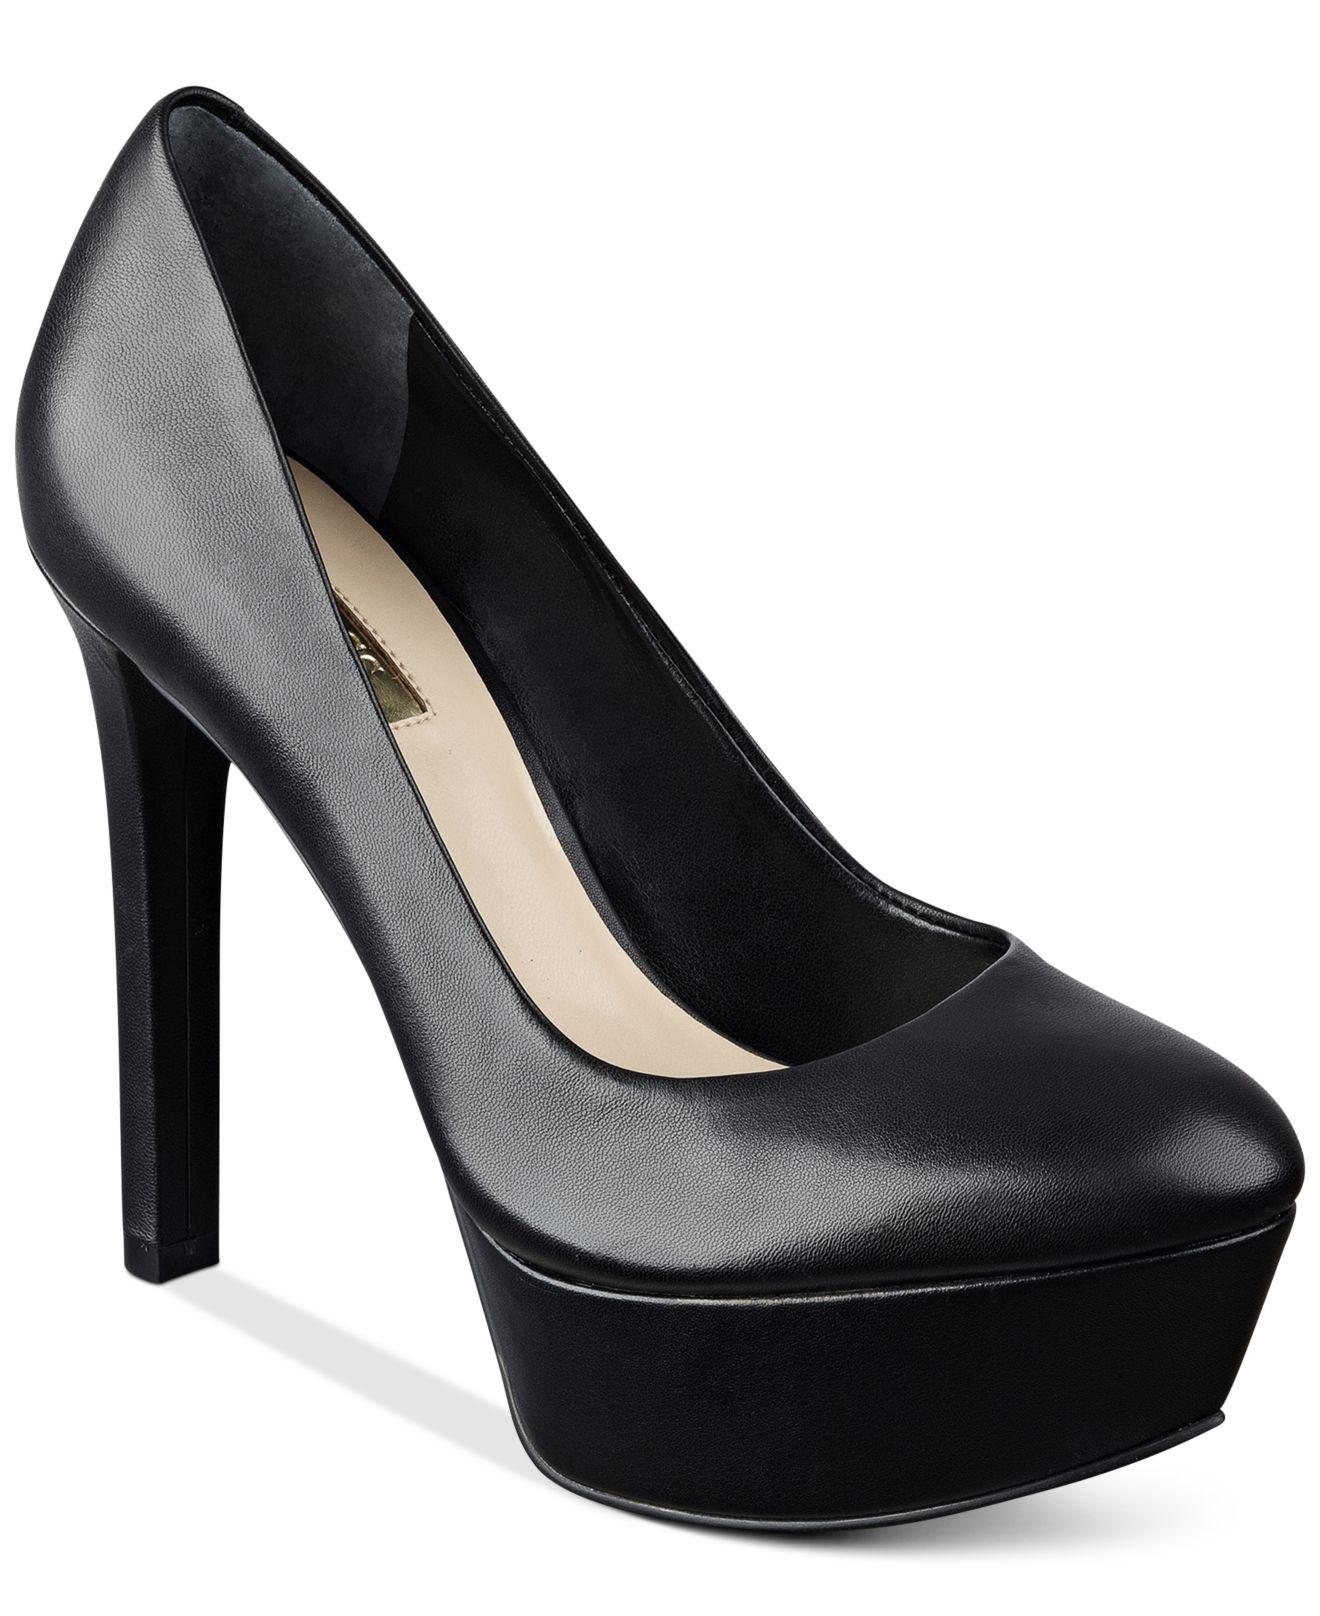 Womens Shoes GUESS Ette Black Leather